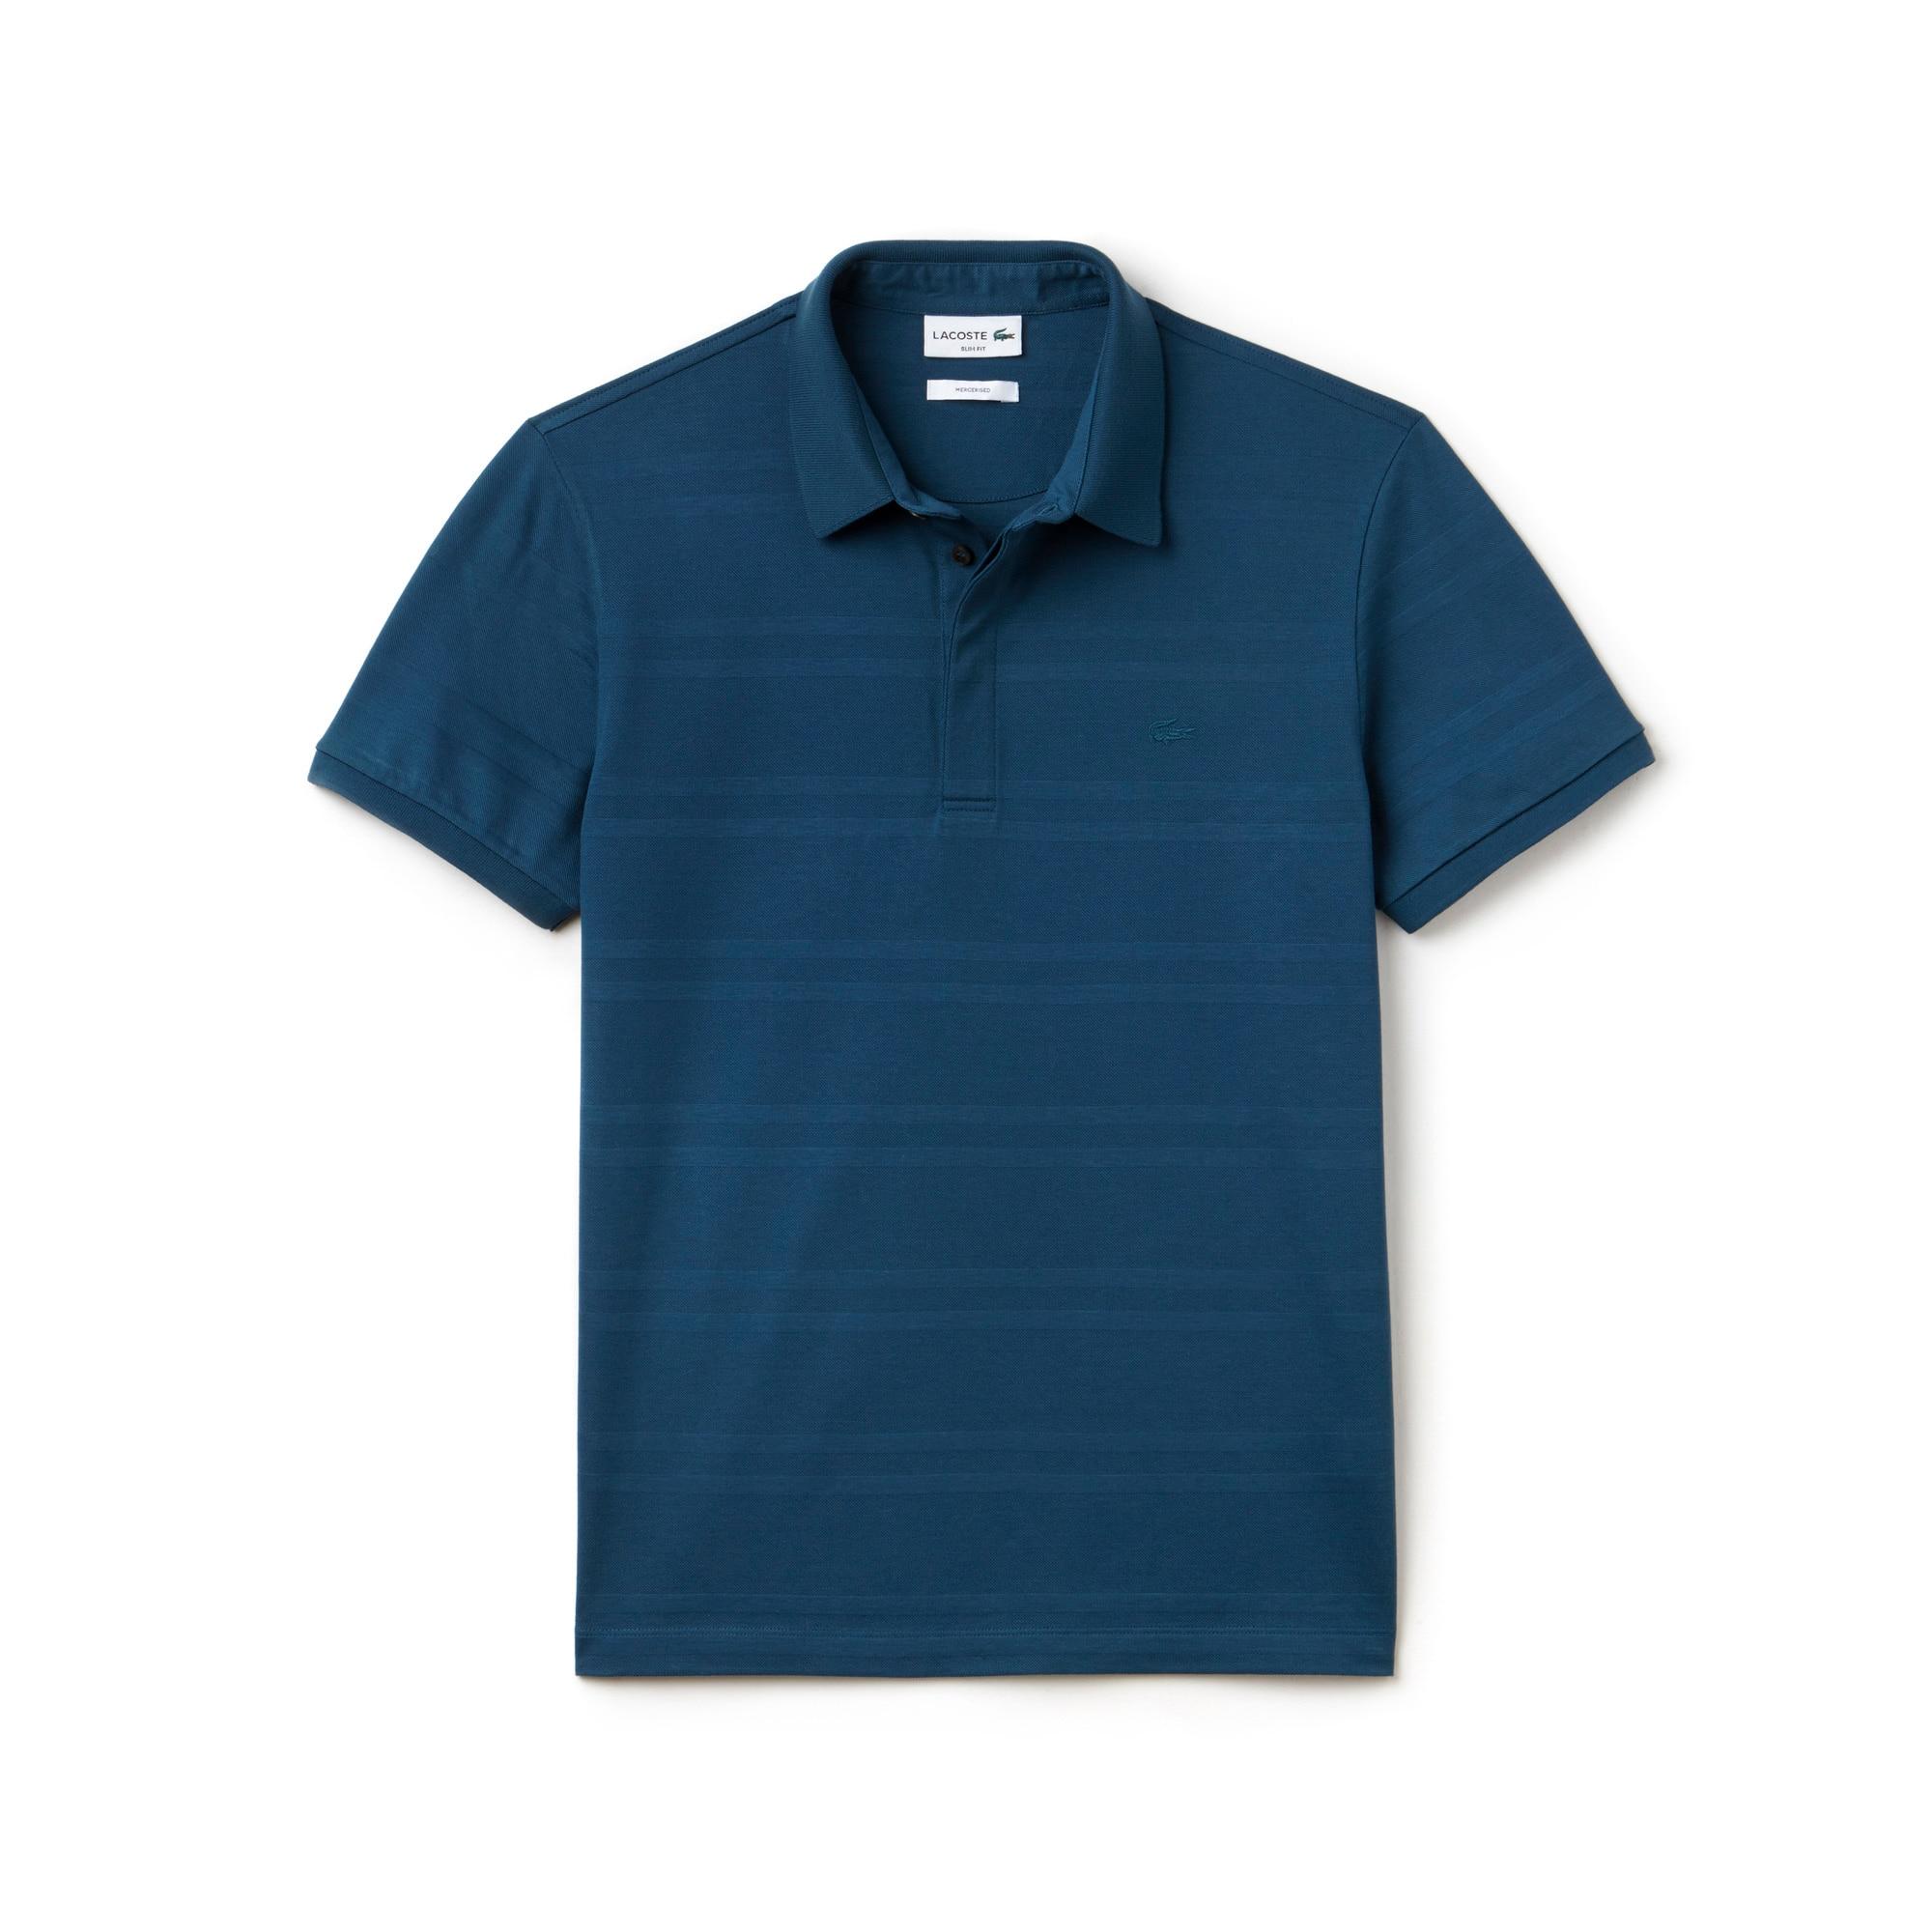 Men's Slim Fit Striped Mercerized Cotton Polo Shirt